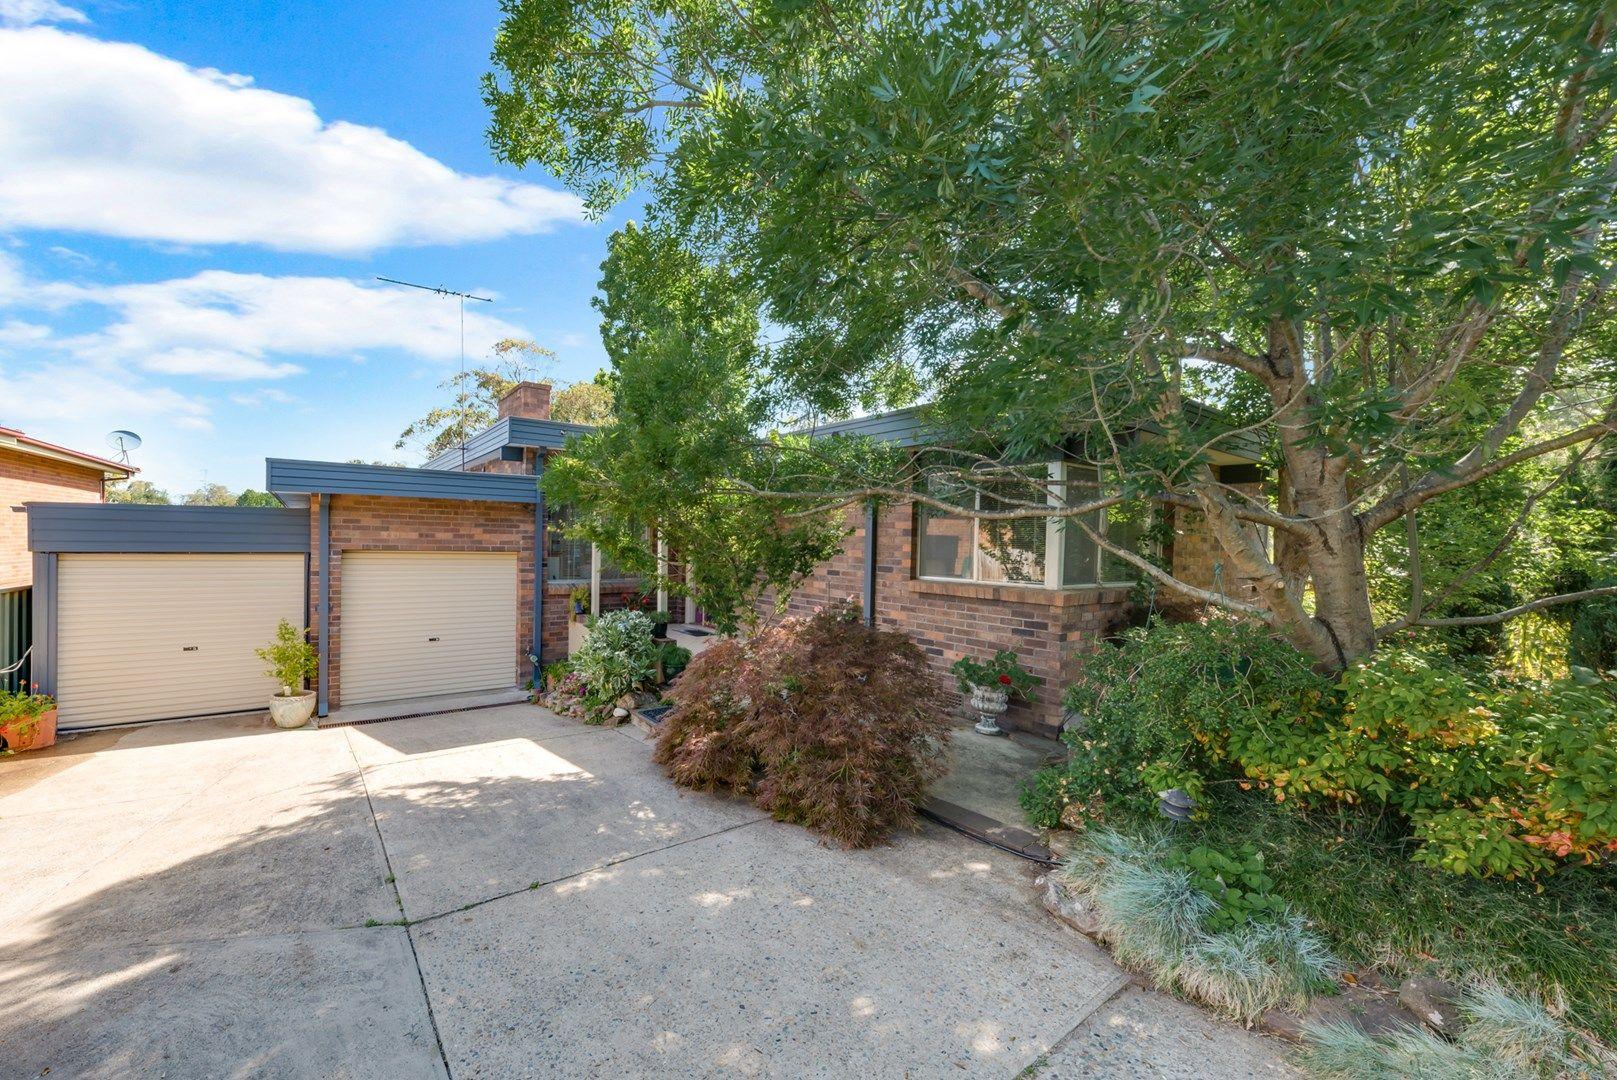 64 Hilda Street, Blaxland NSW 2774, Image 0